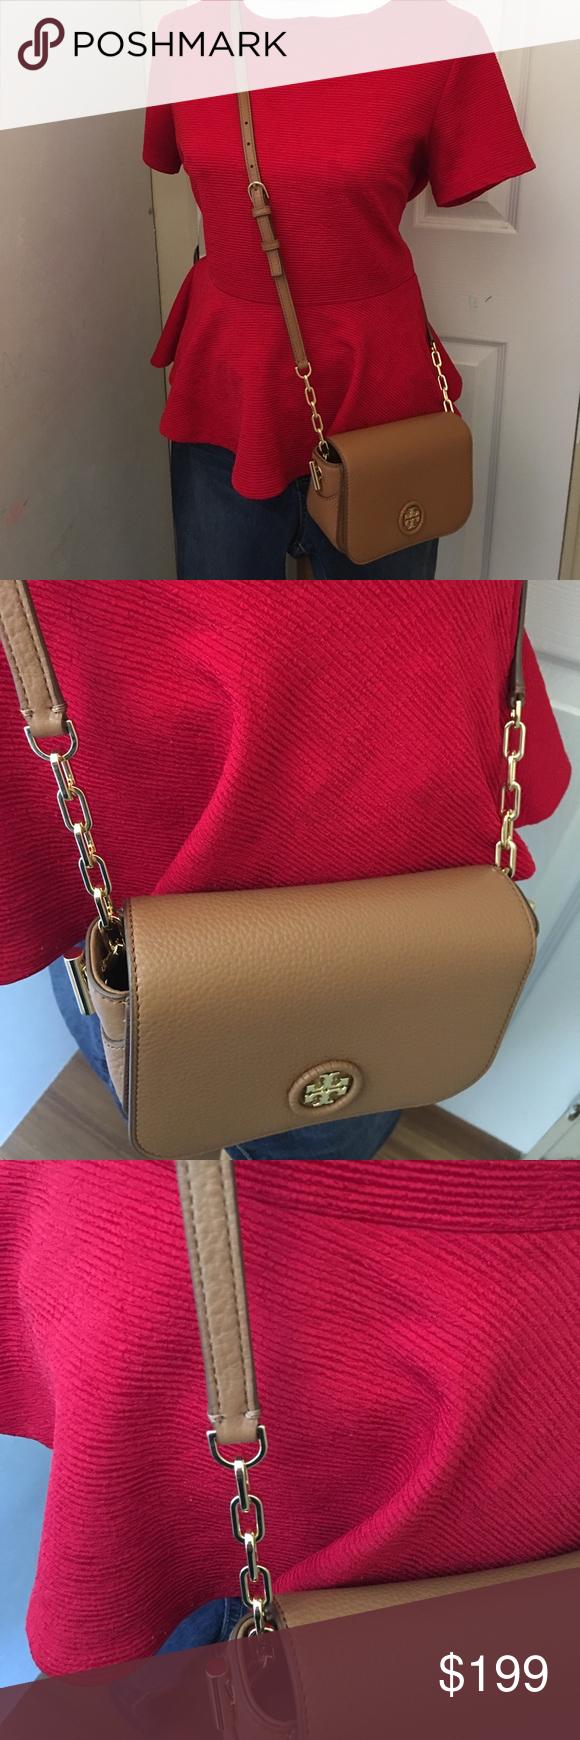 9df2b4813ec3 Tory Burch whipstitch logo mini crossbody bag Brand new crossbody bag. It  fits iPhone 7 plus Tory Burch Bags Crossbody Bags